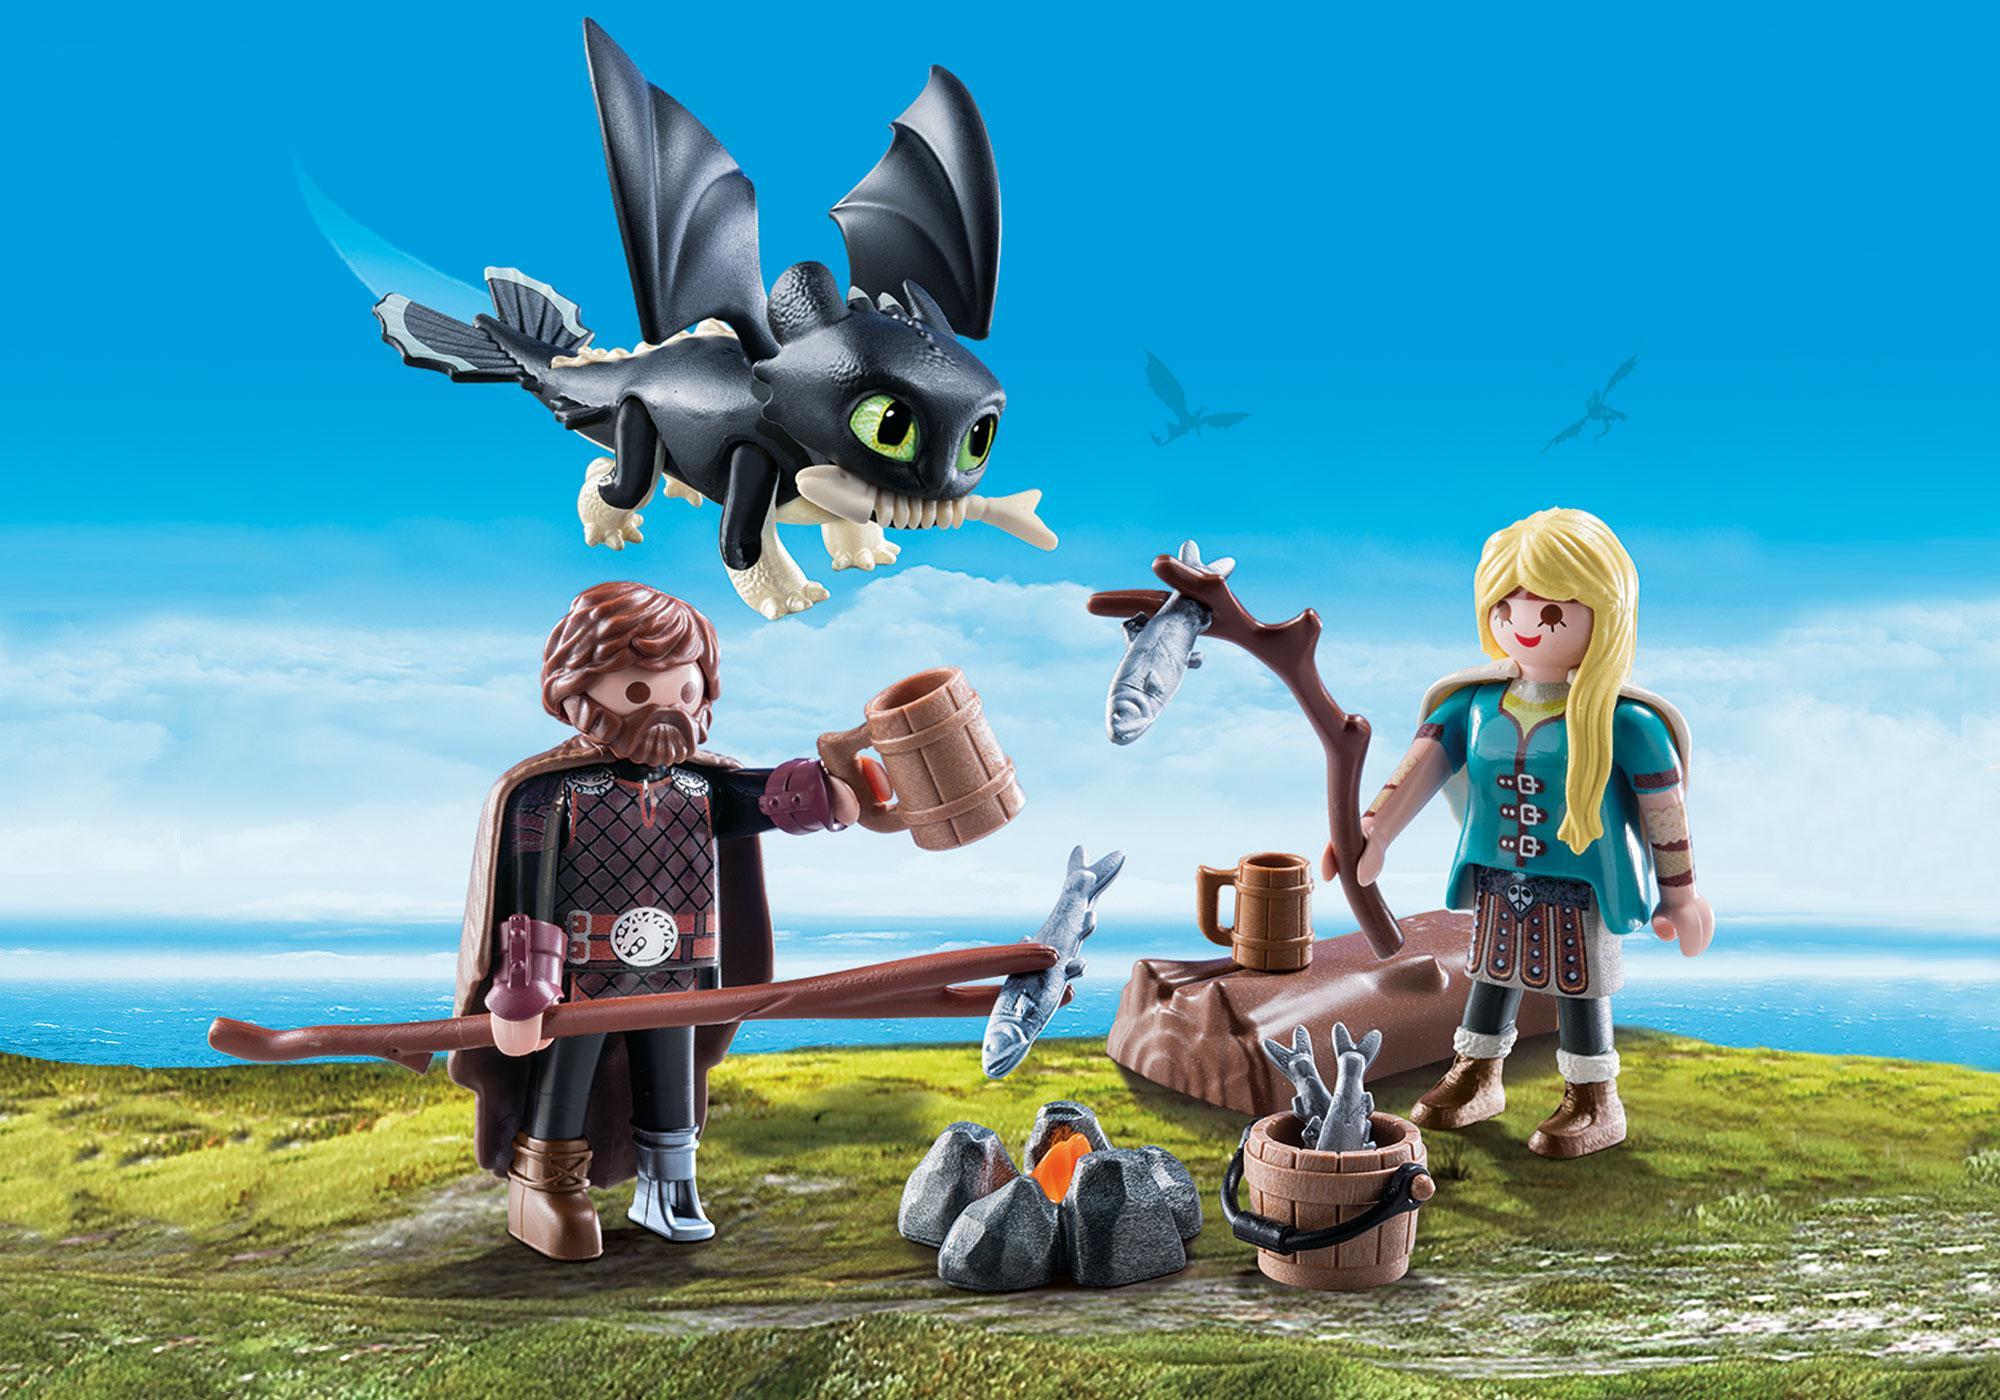 http://media.playmobil.com/i/playmobil/70040_product_detail/Hipo y Astrid con bebé dragón